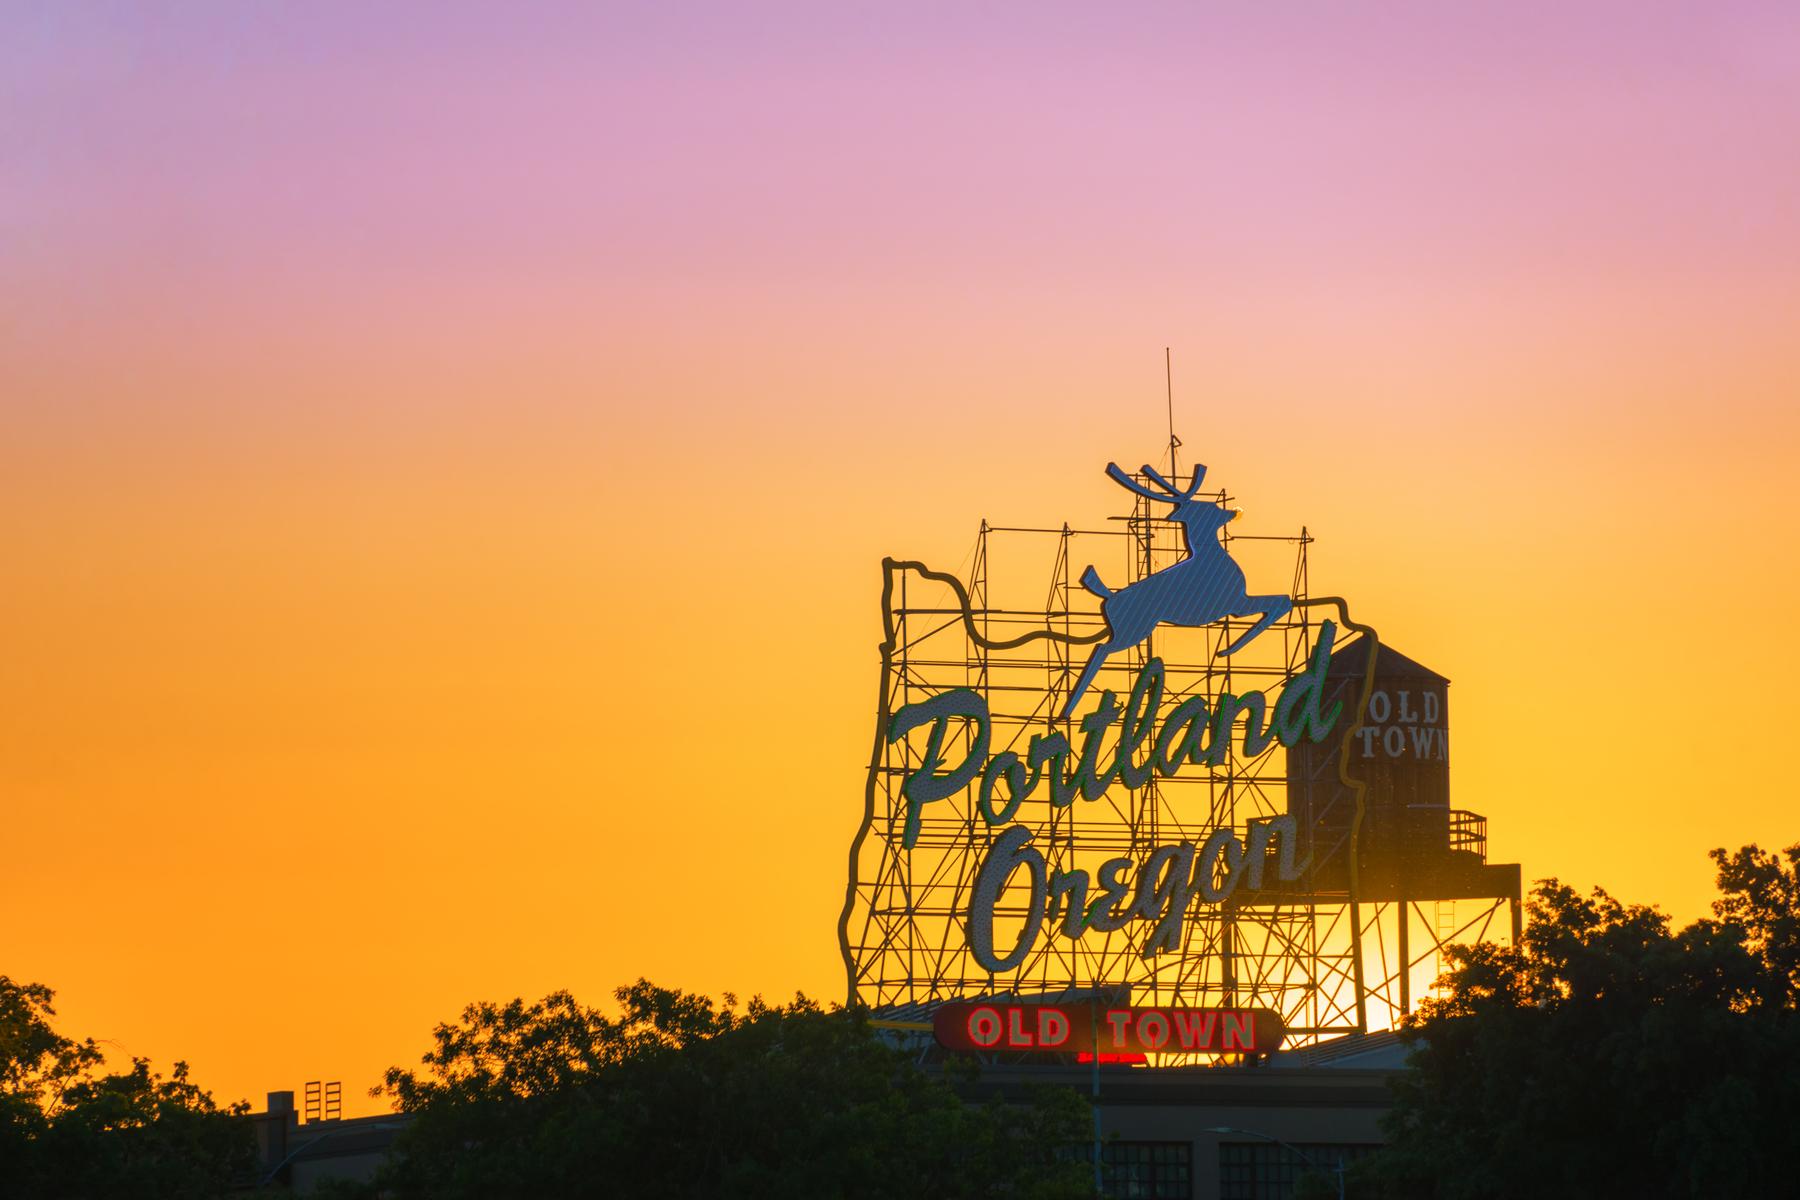 portland_featured_image